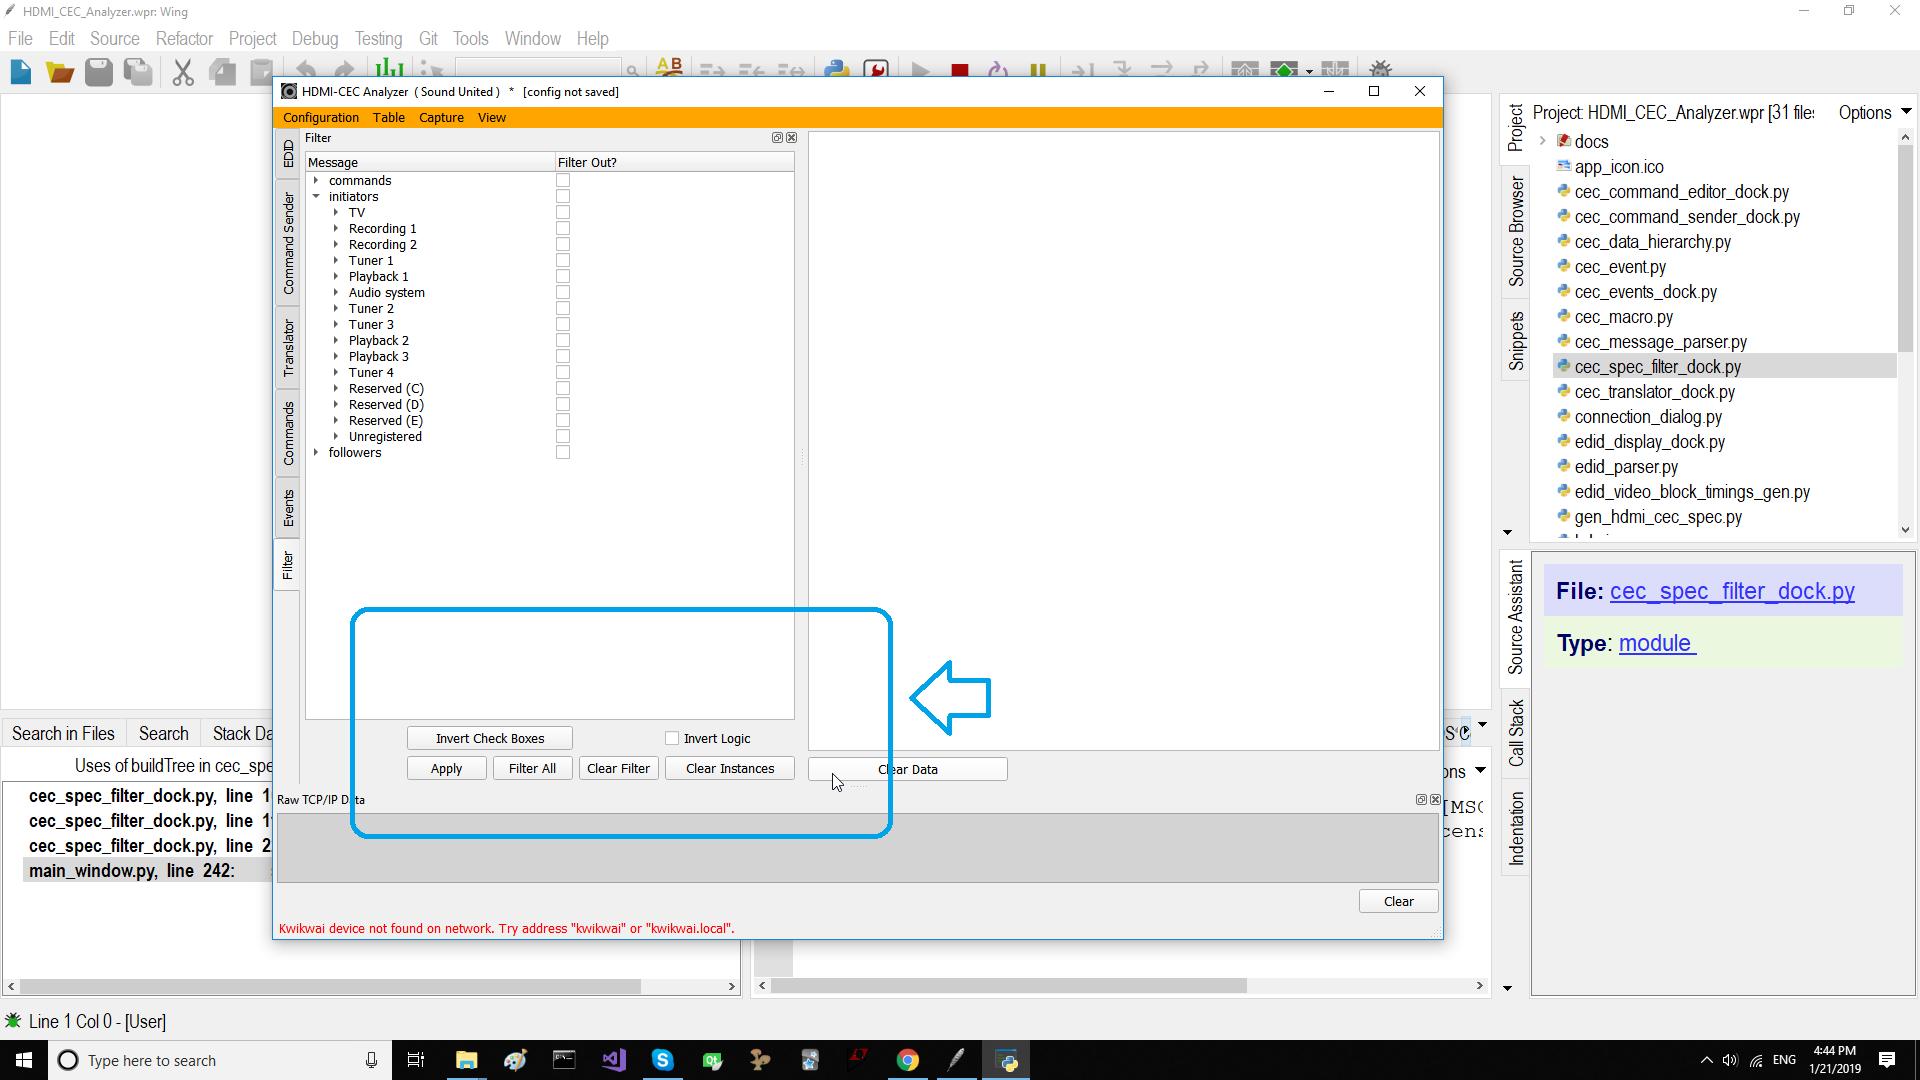 0_1557930948520_HDMI-CEC_AnalyzerScreenshot3.png